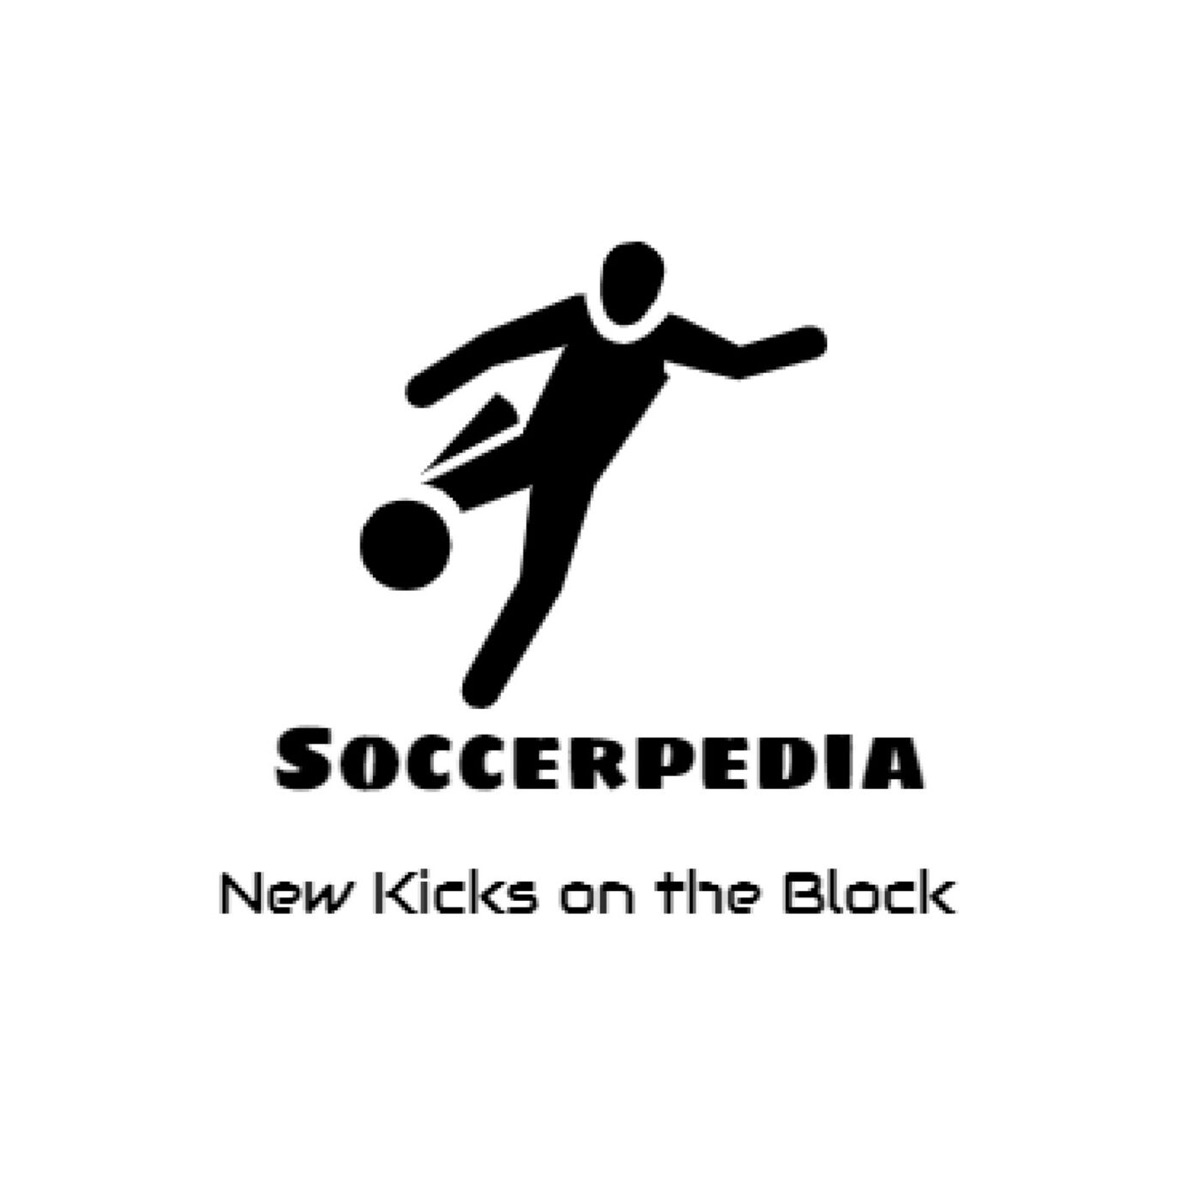 Soccerpedia